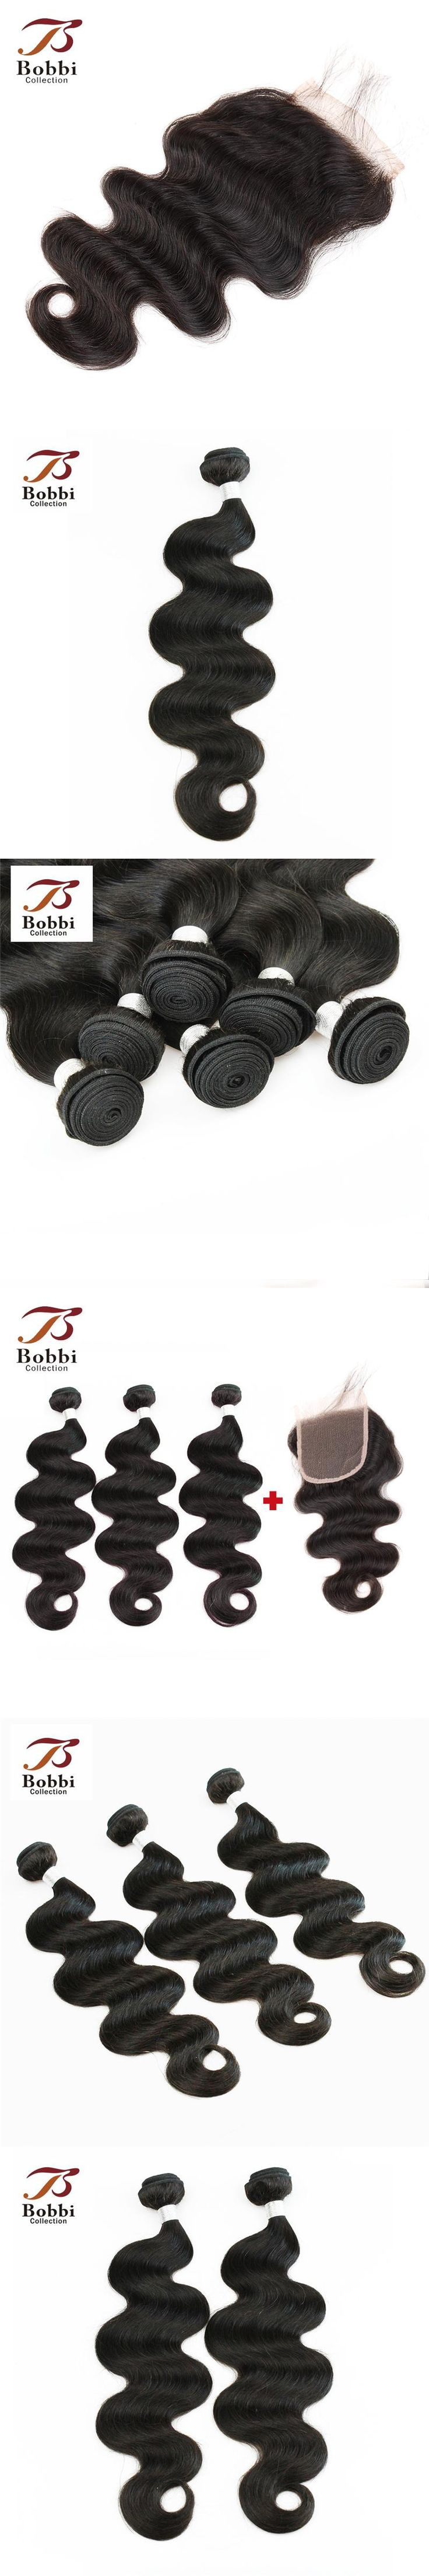 Brazilian Hair Bundle with 4*4 Lace Closure Natural Color Body Wave Brazilian Weaving Non Remy Hair Bundle with Closure Bobbi